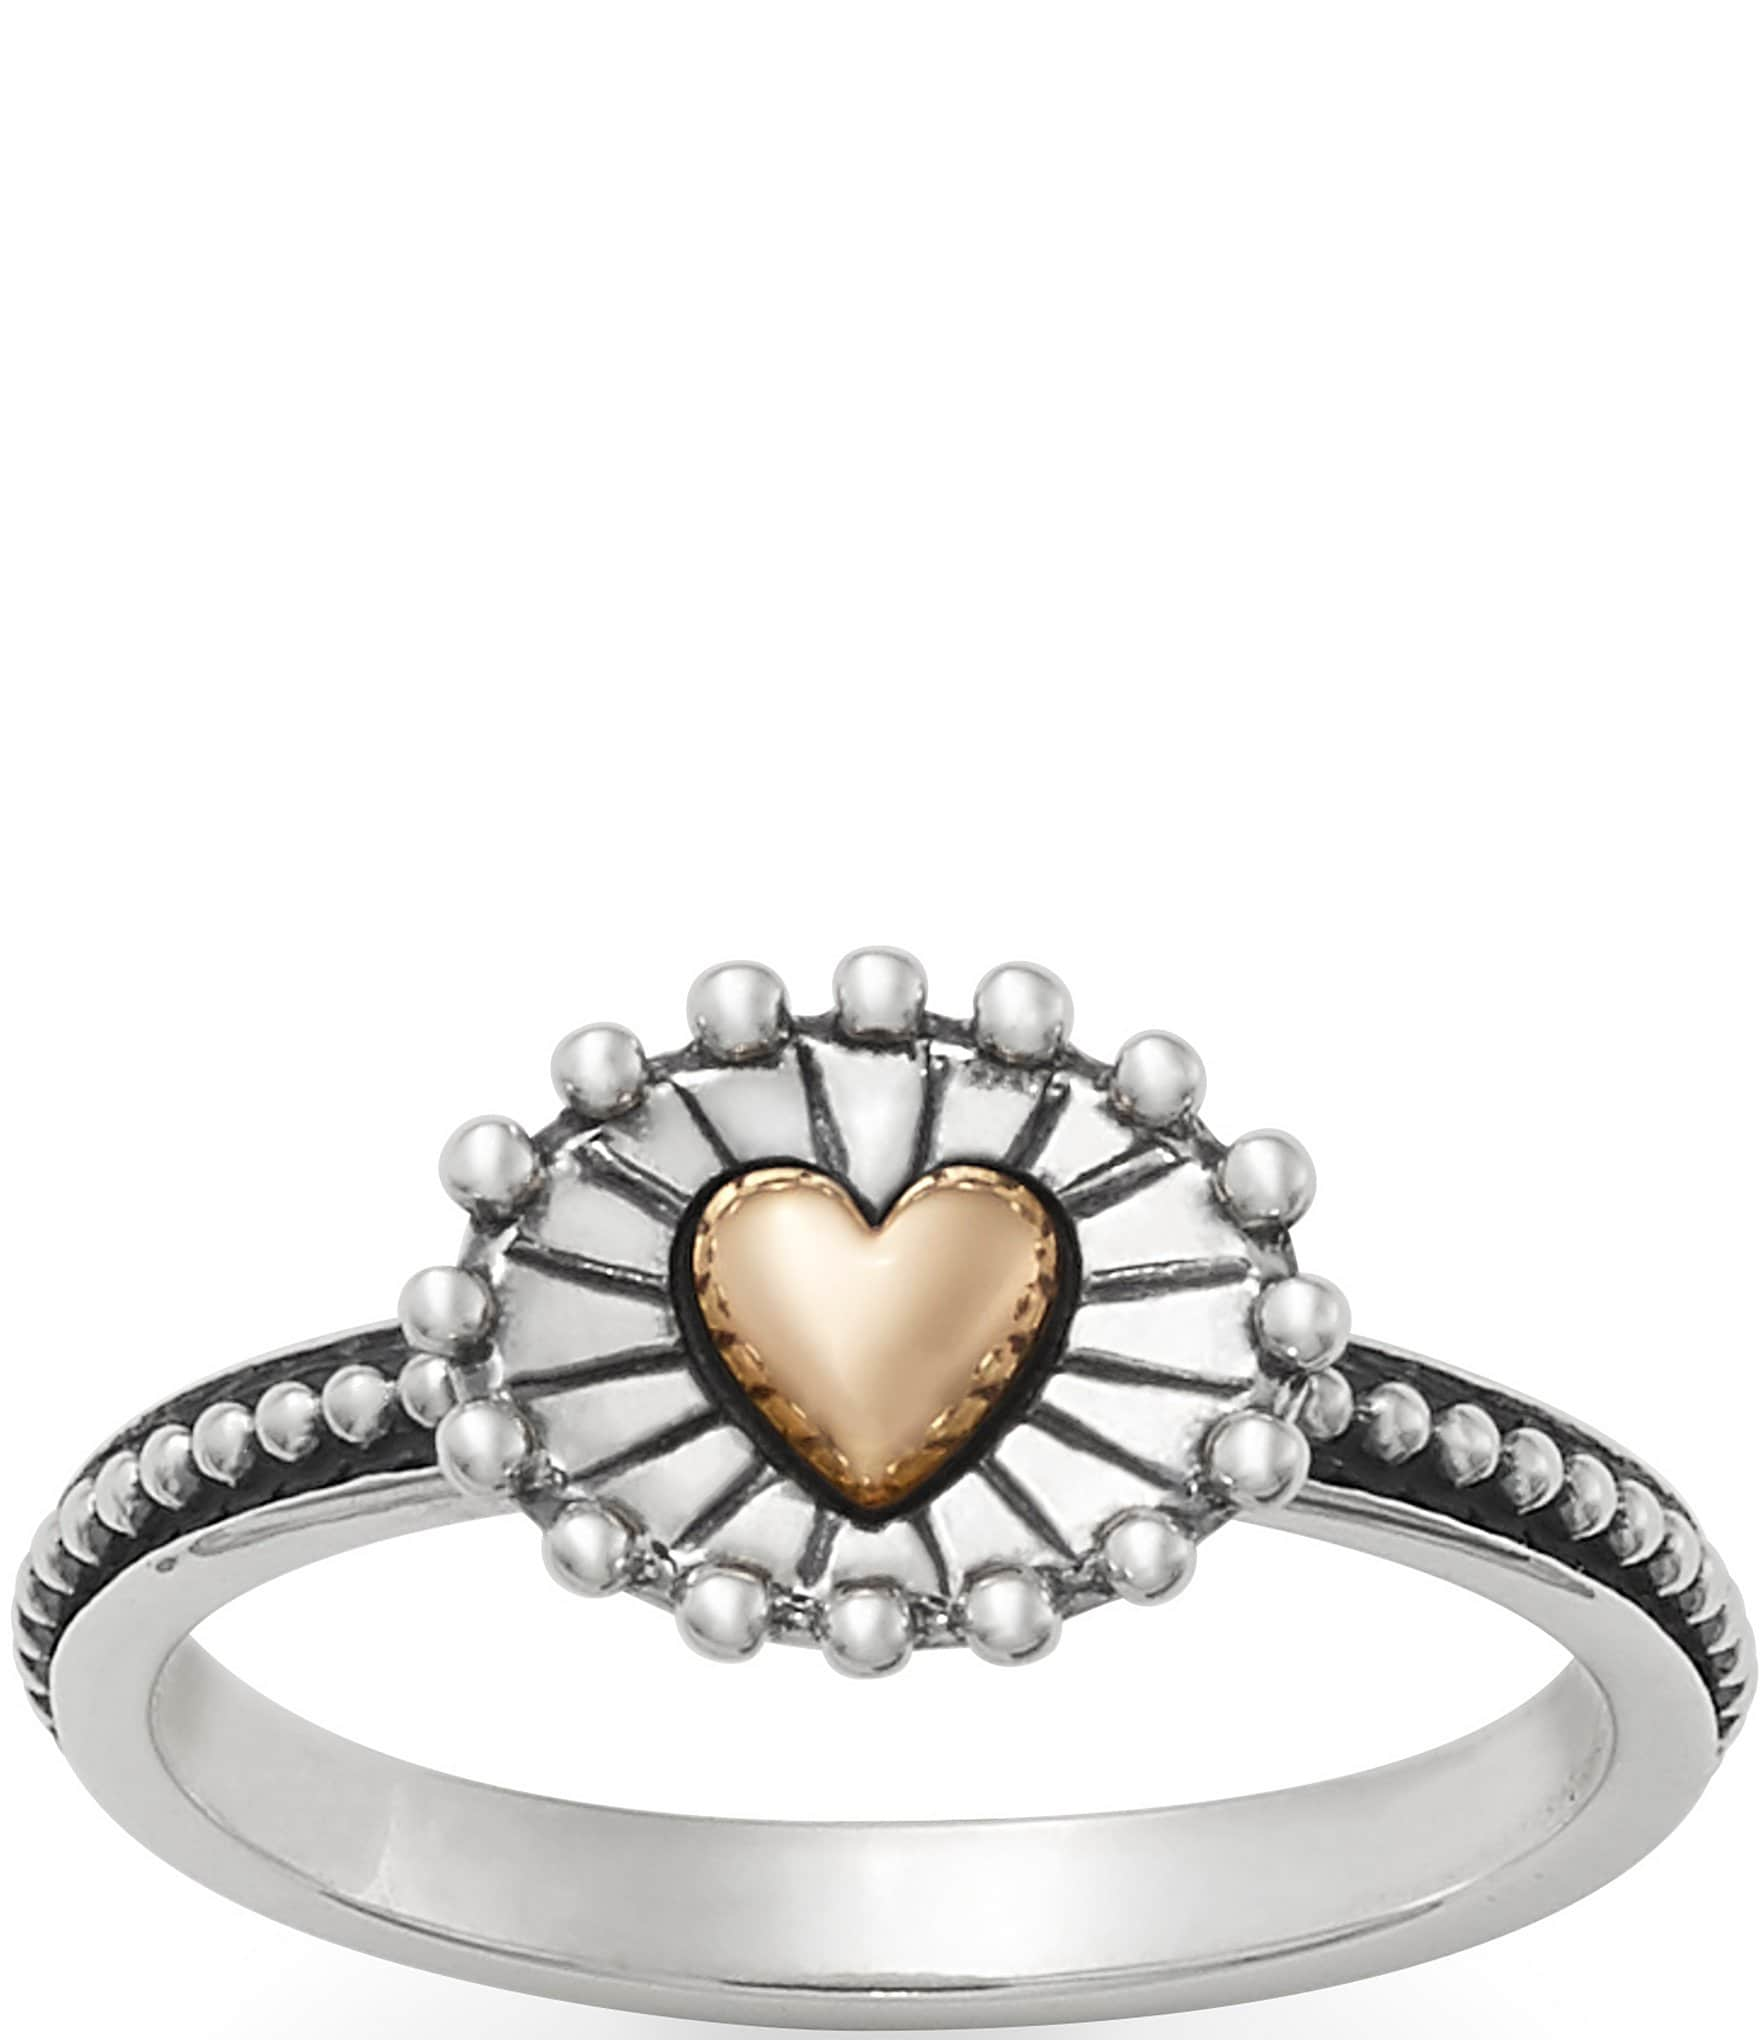 James Avery Two Tone Women S Jewelry Dillard S